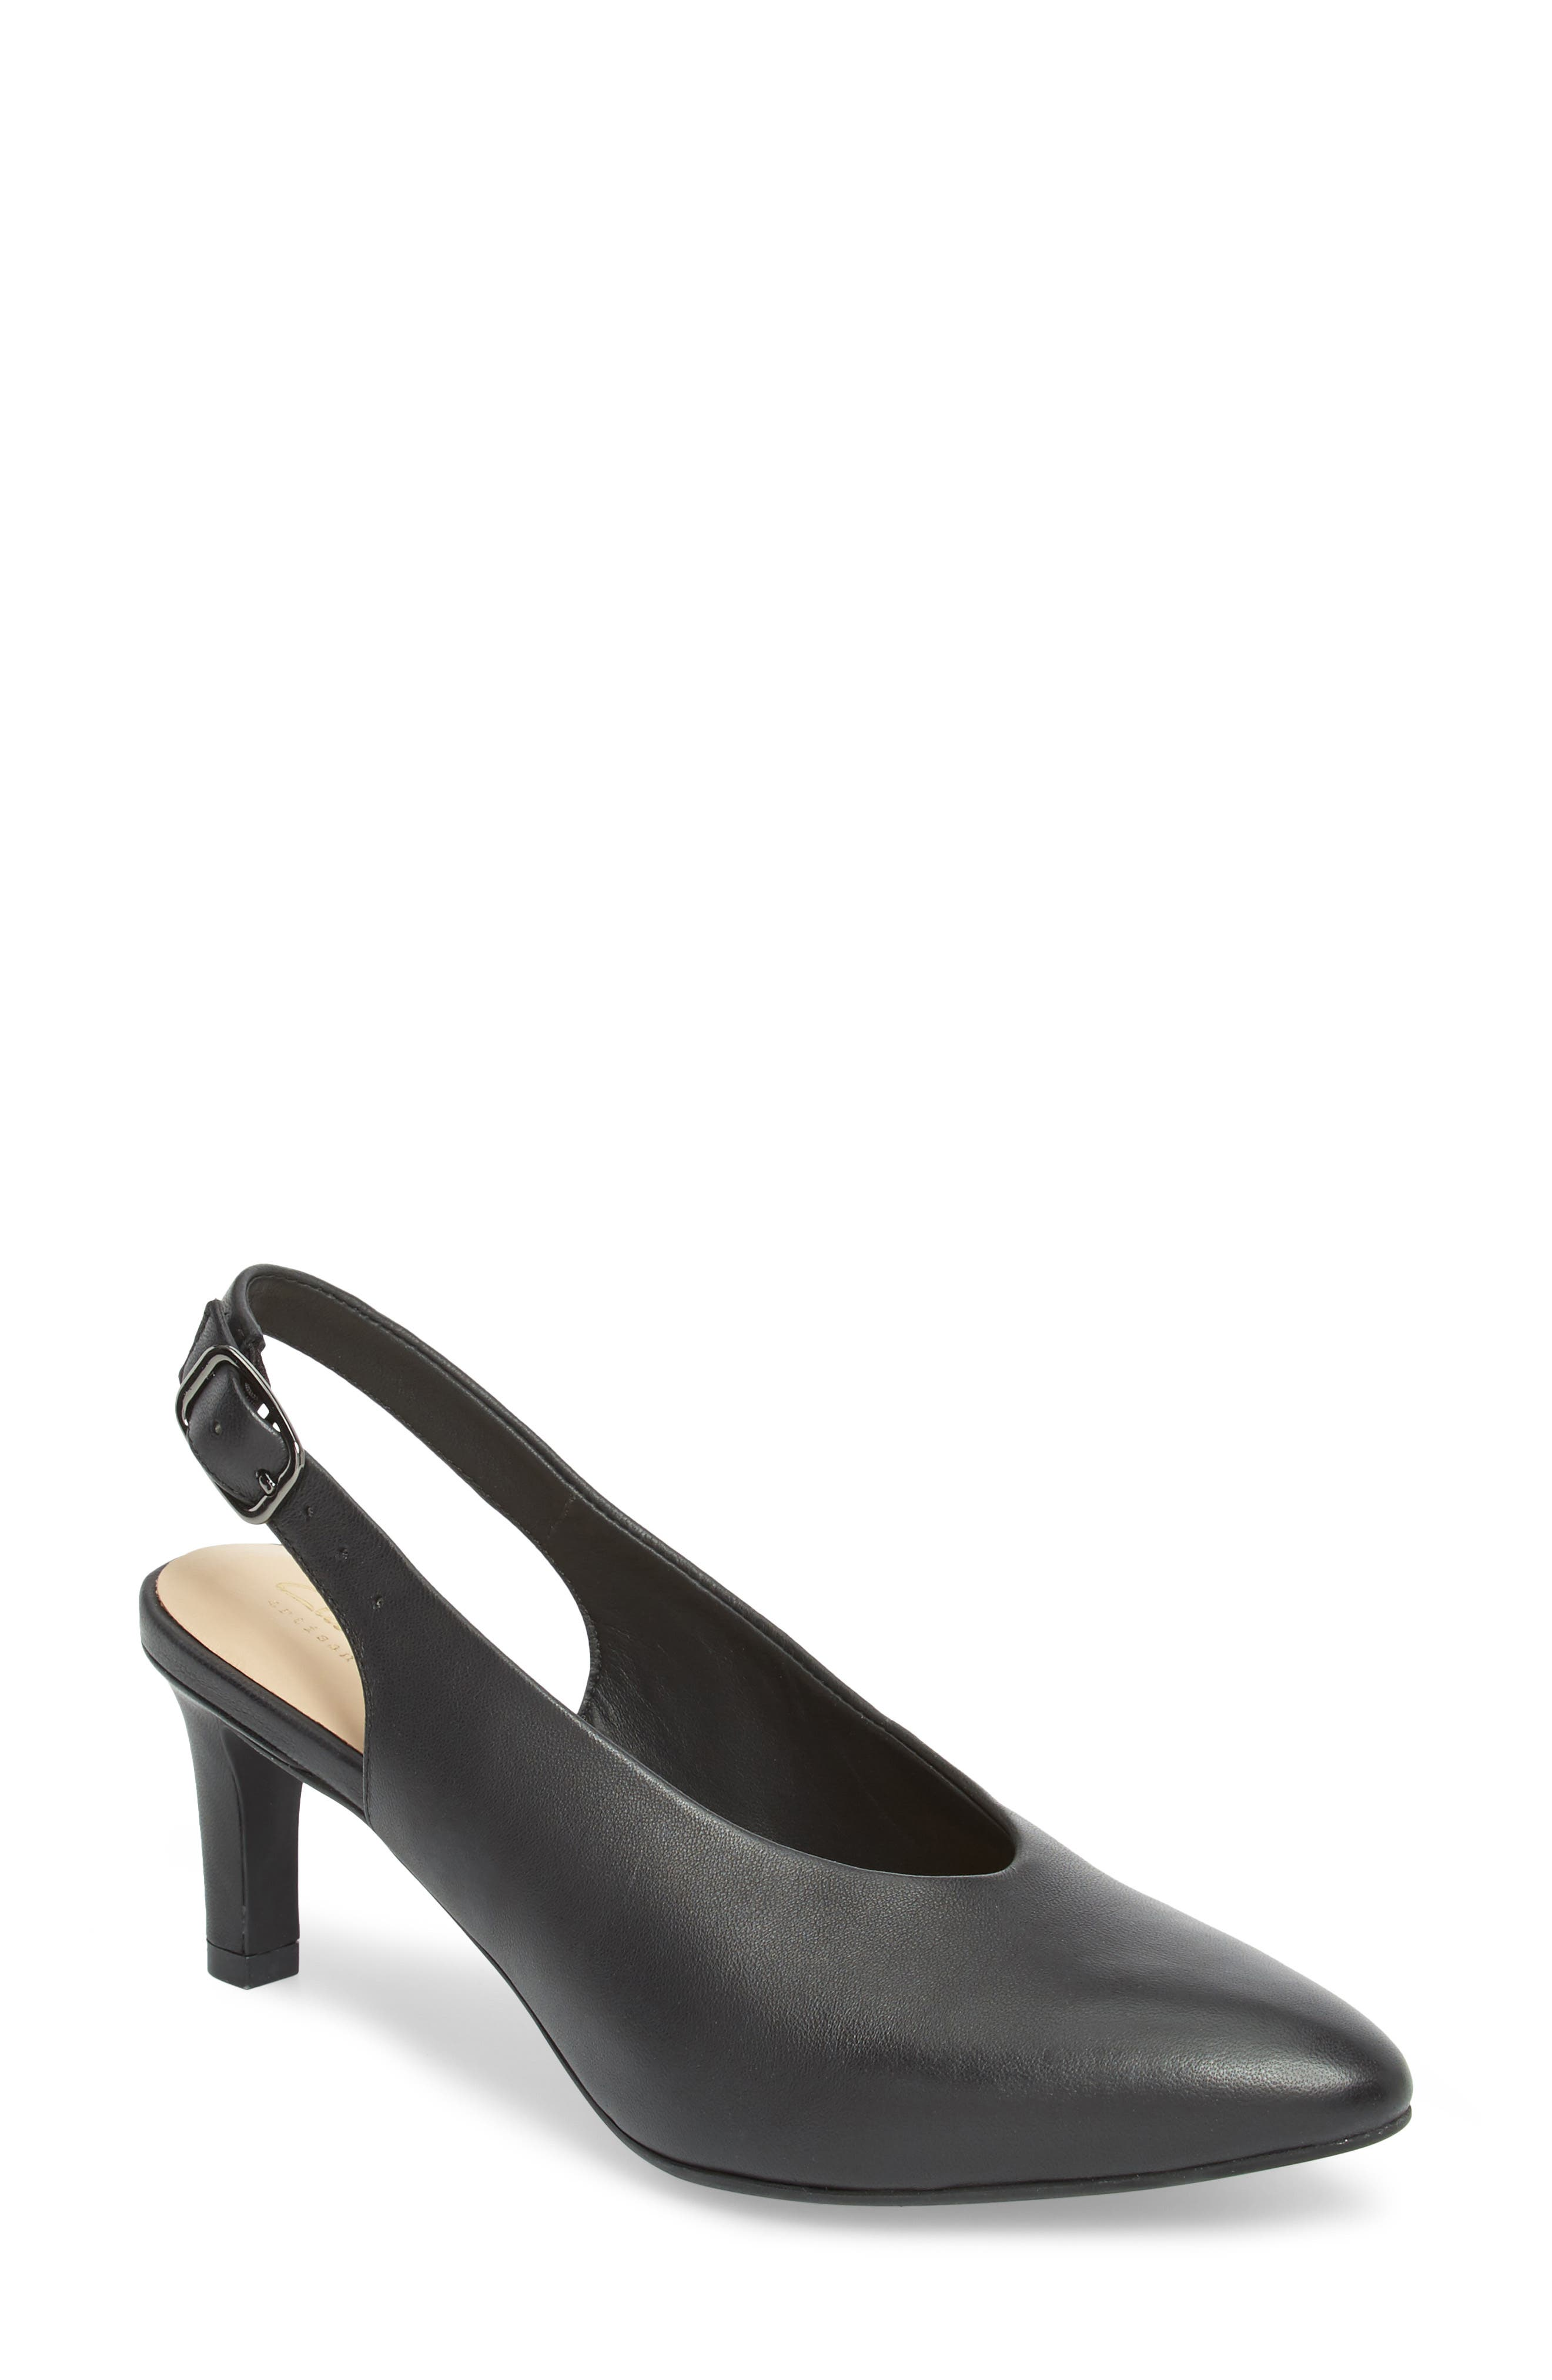 Calla Violet Kitten Heel Pump,                         Main,                         color, Black Leather